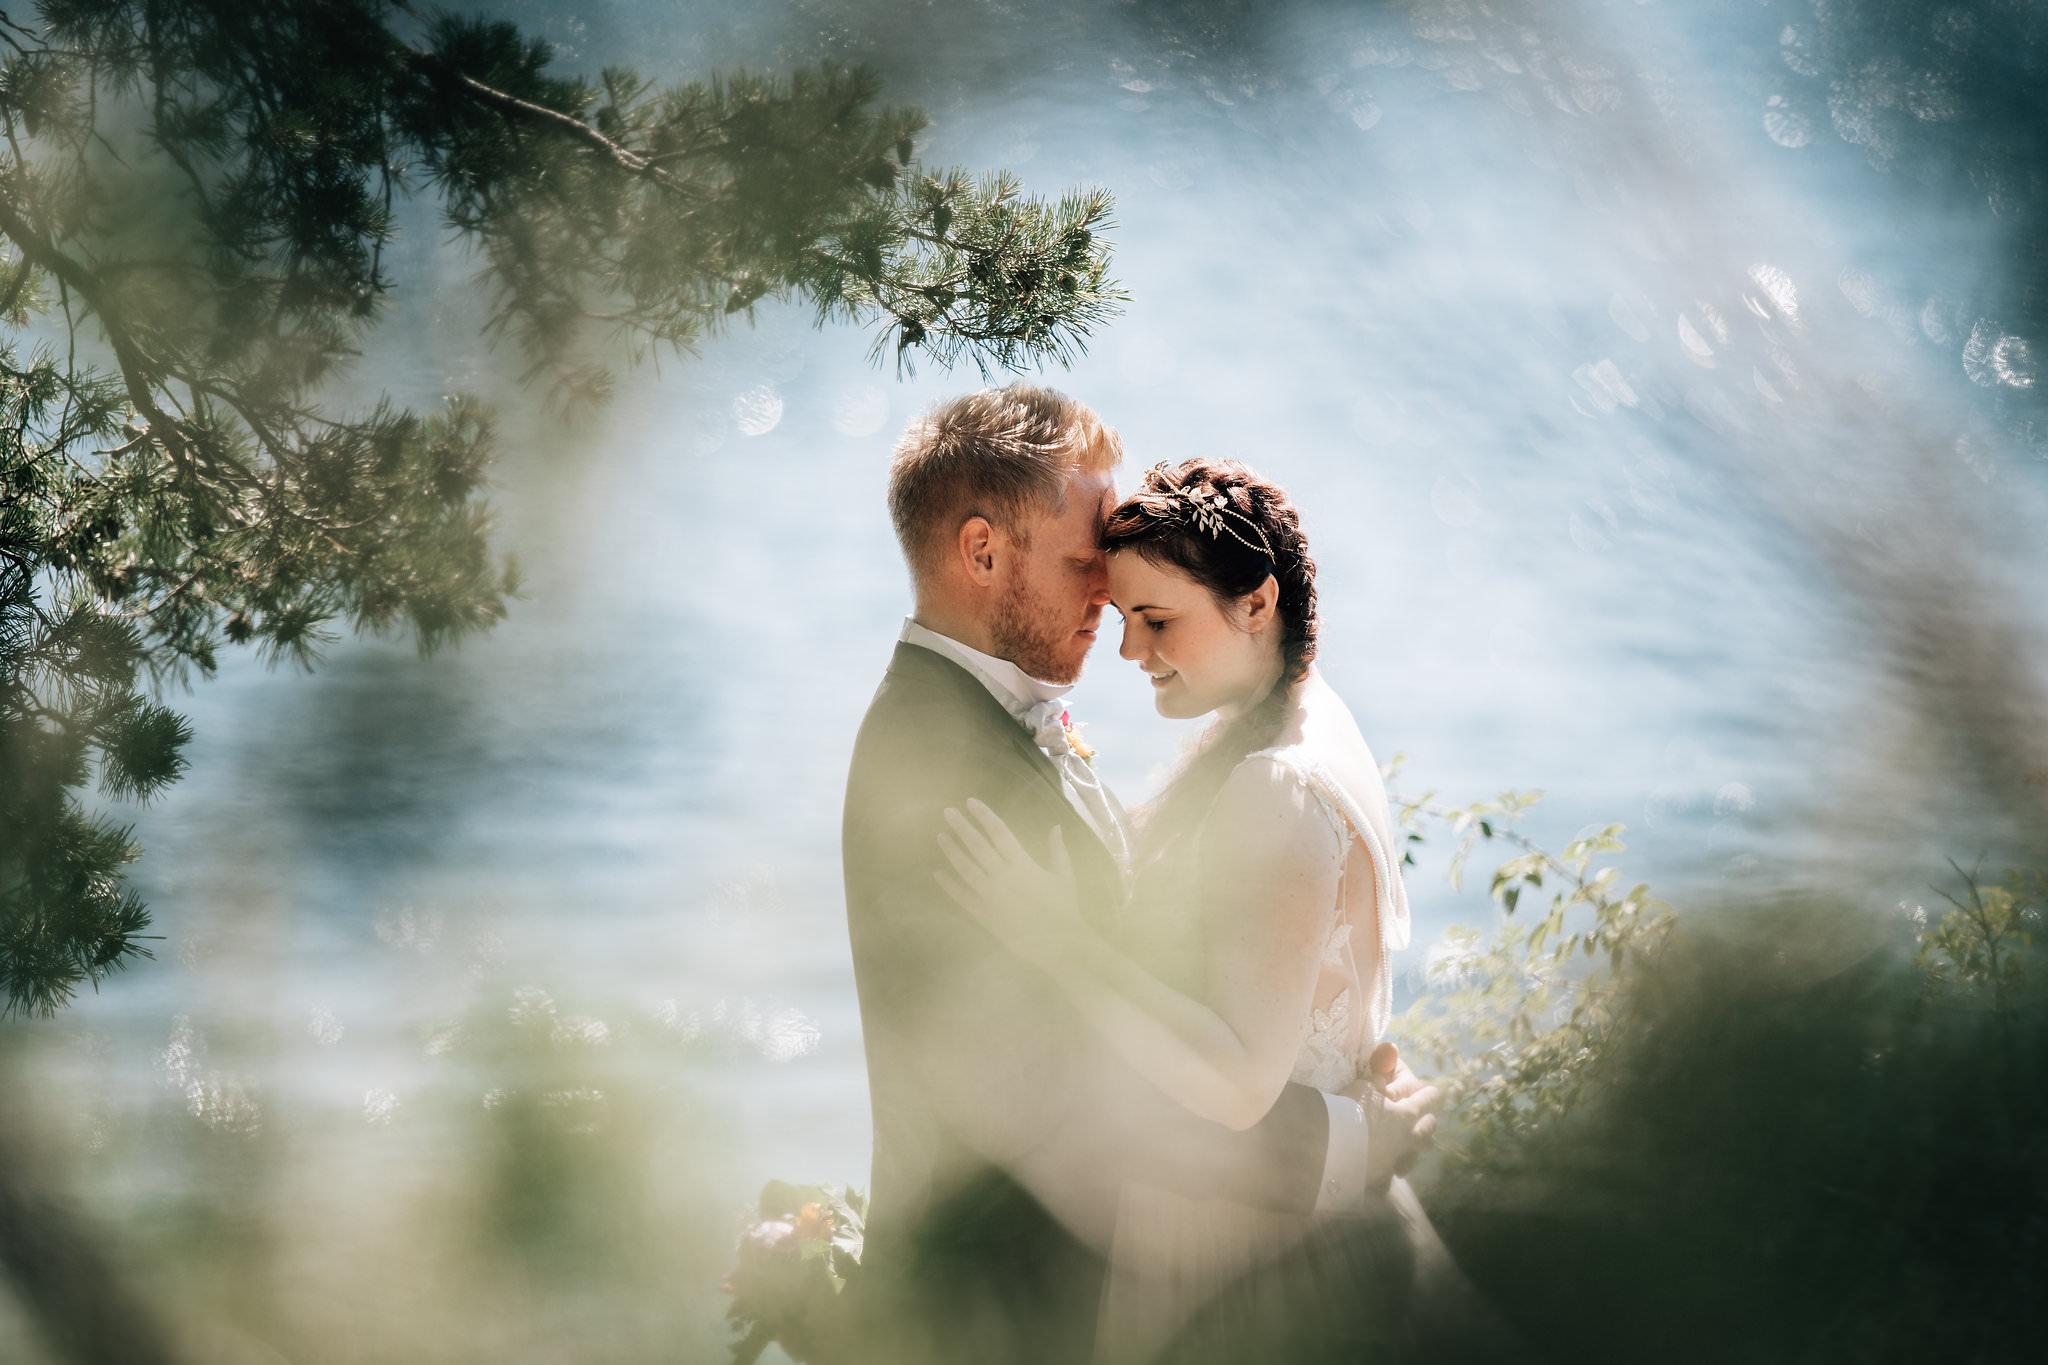 _N859851-fotograf-vestfold-bryllupsfotograf-.jpg